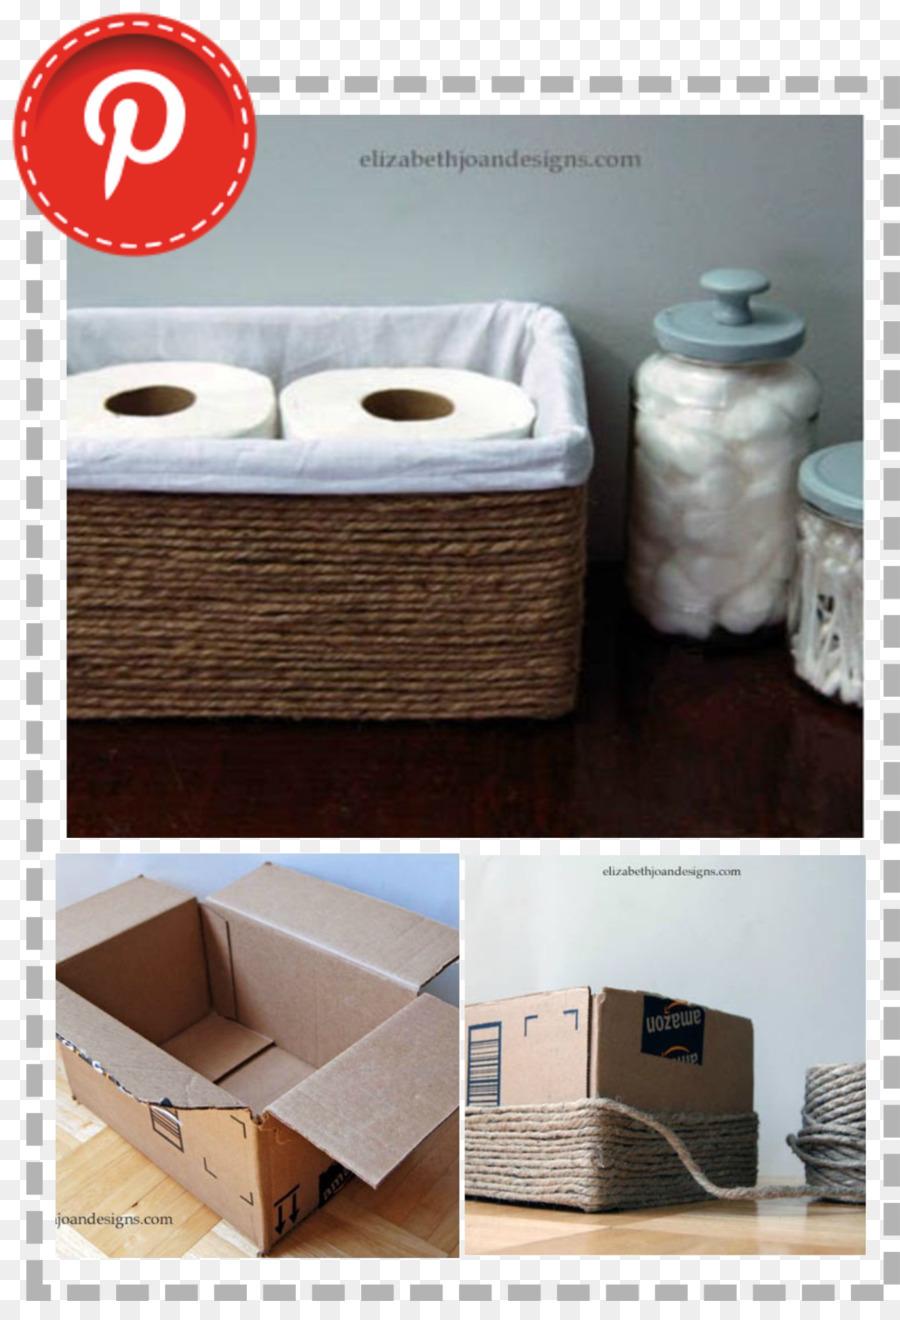 Basket cardboard box do it yourself bathroom diy album png basket cardboard box do it yourself bathroom diy album solutioingenieria Images